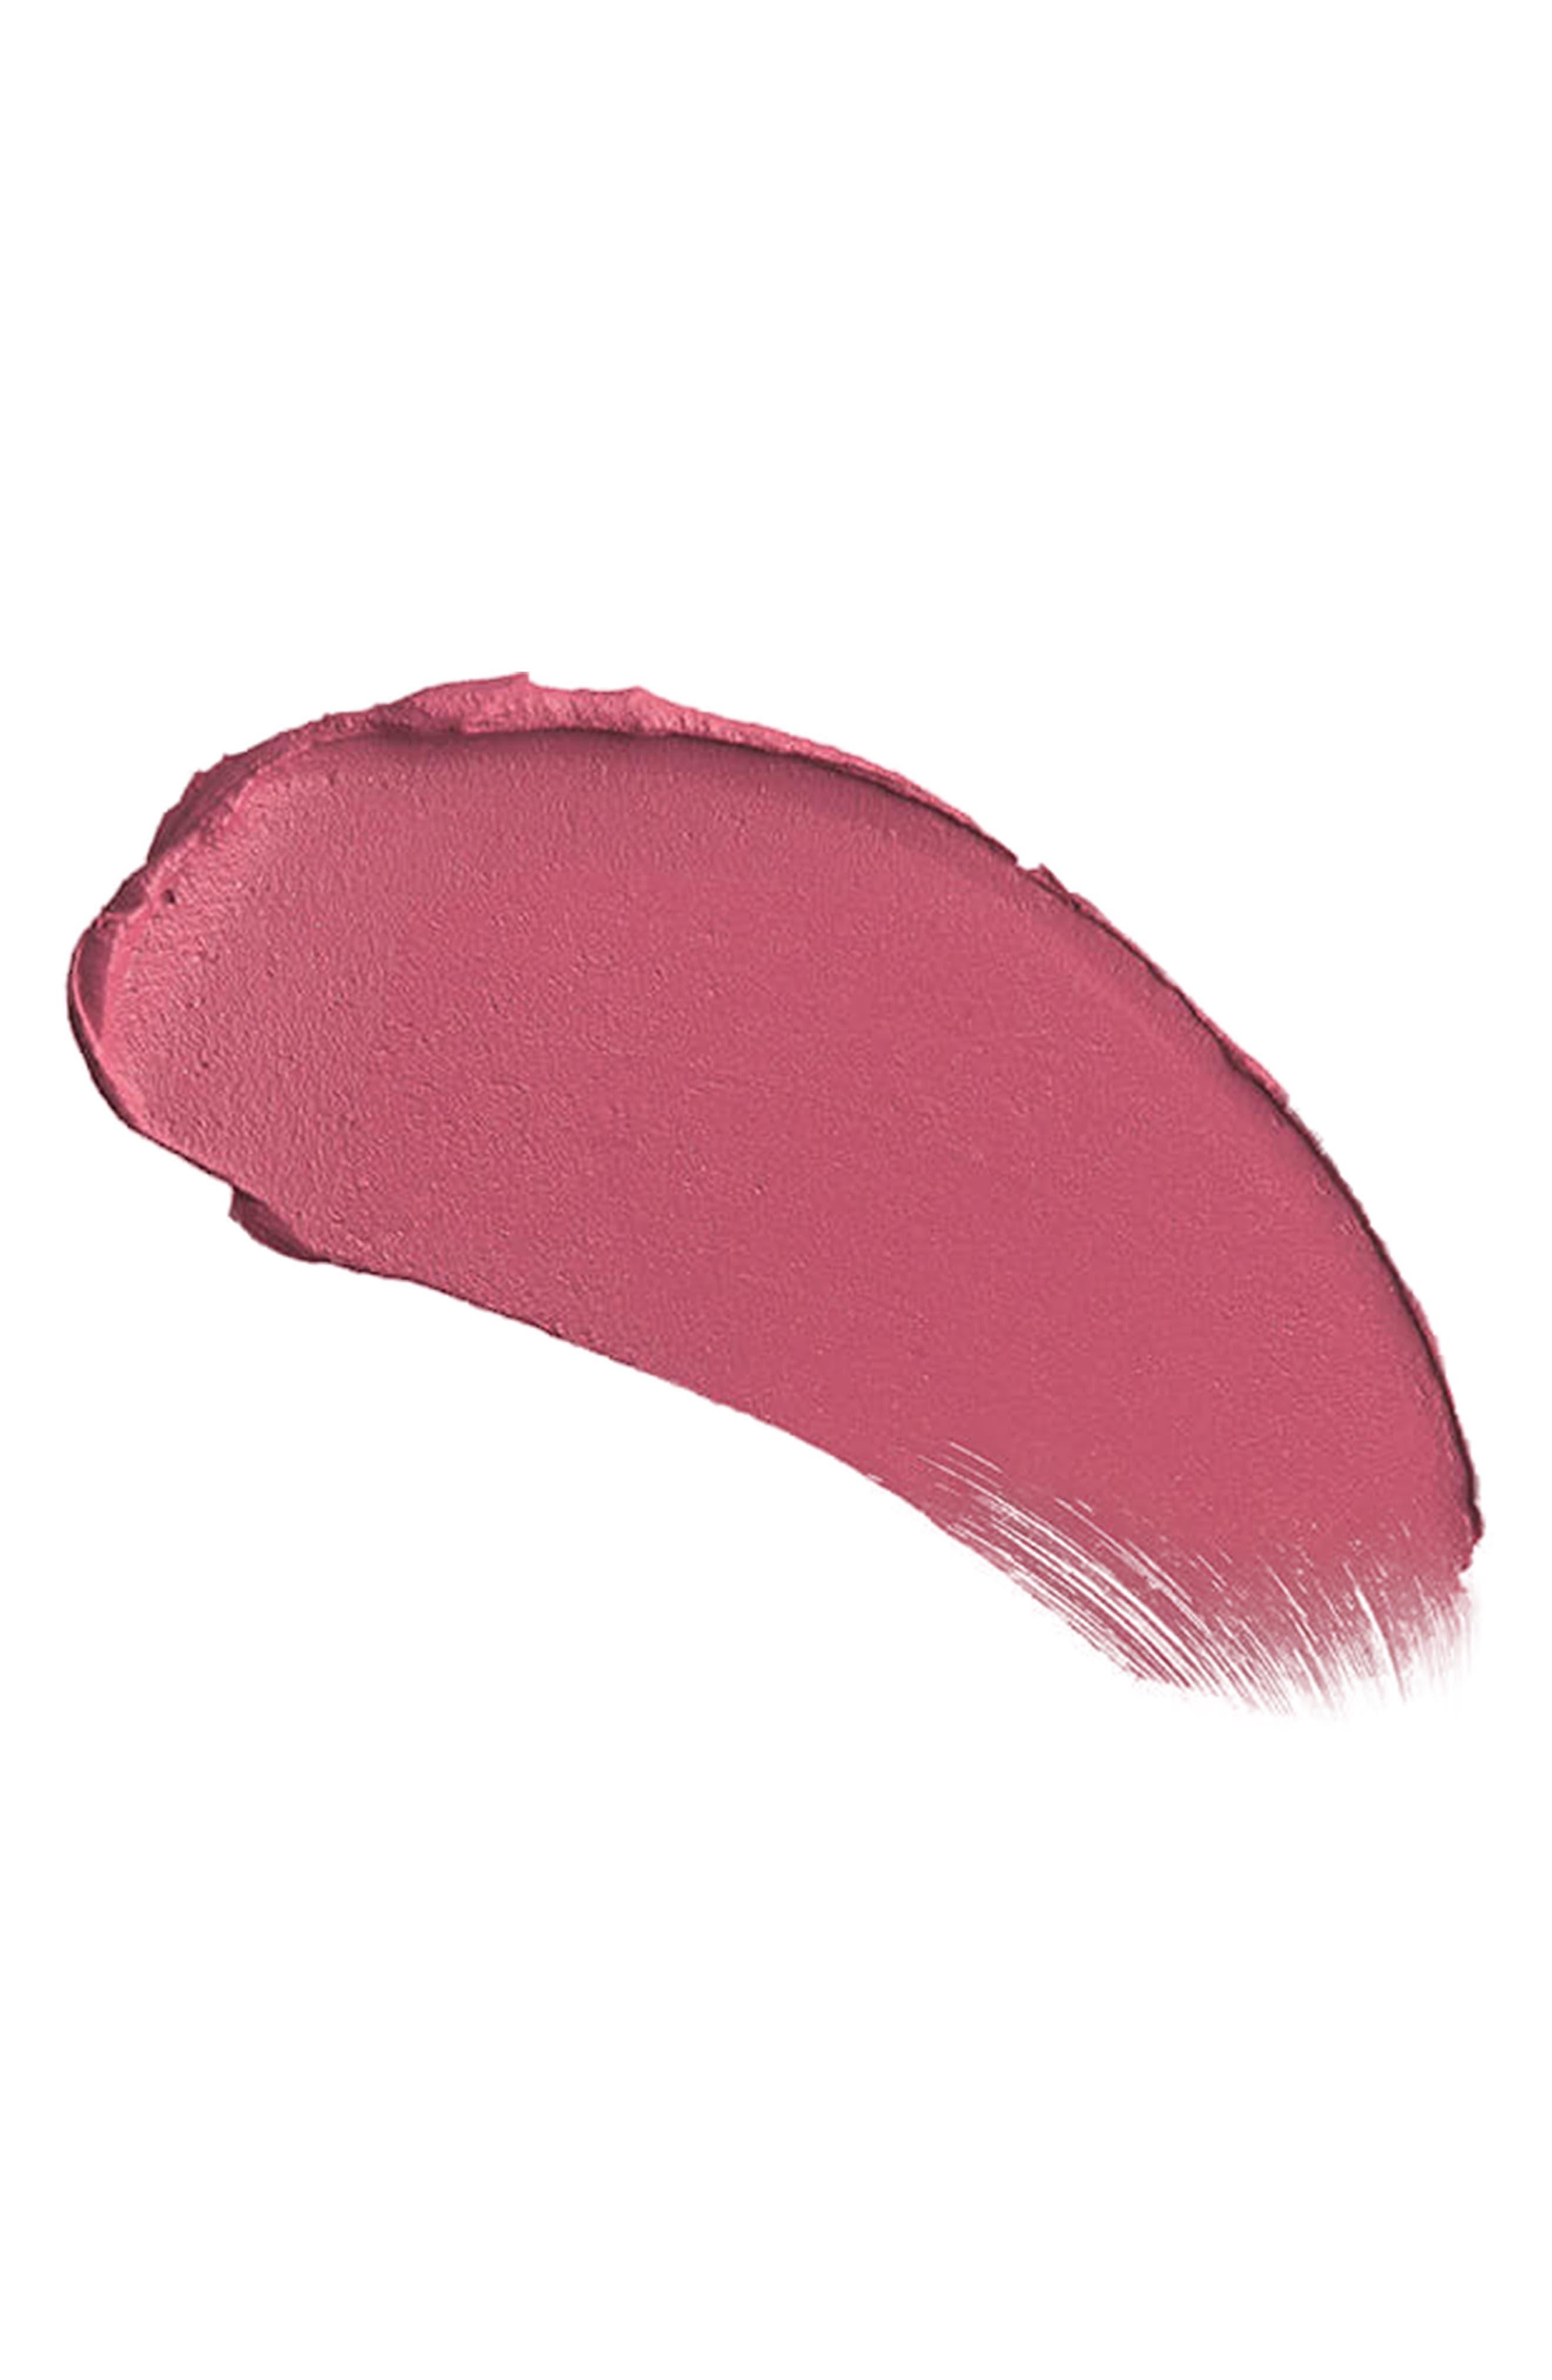 Hot Lips Lipstick,                             Alternate thumbnail 3, color,                             SECRET SALMA